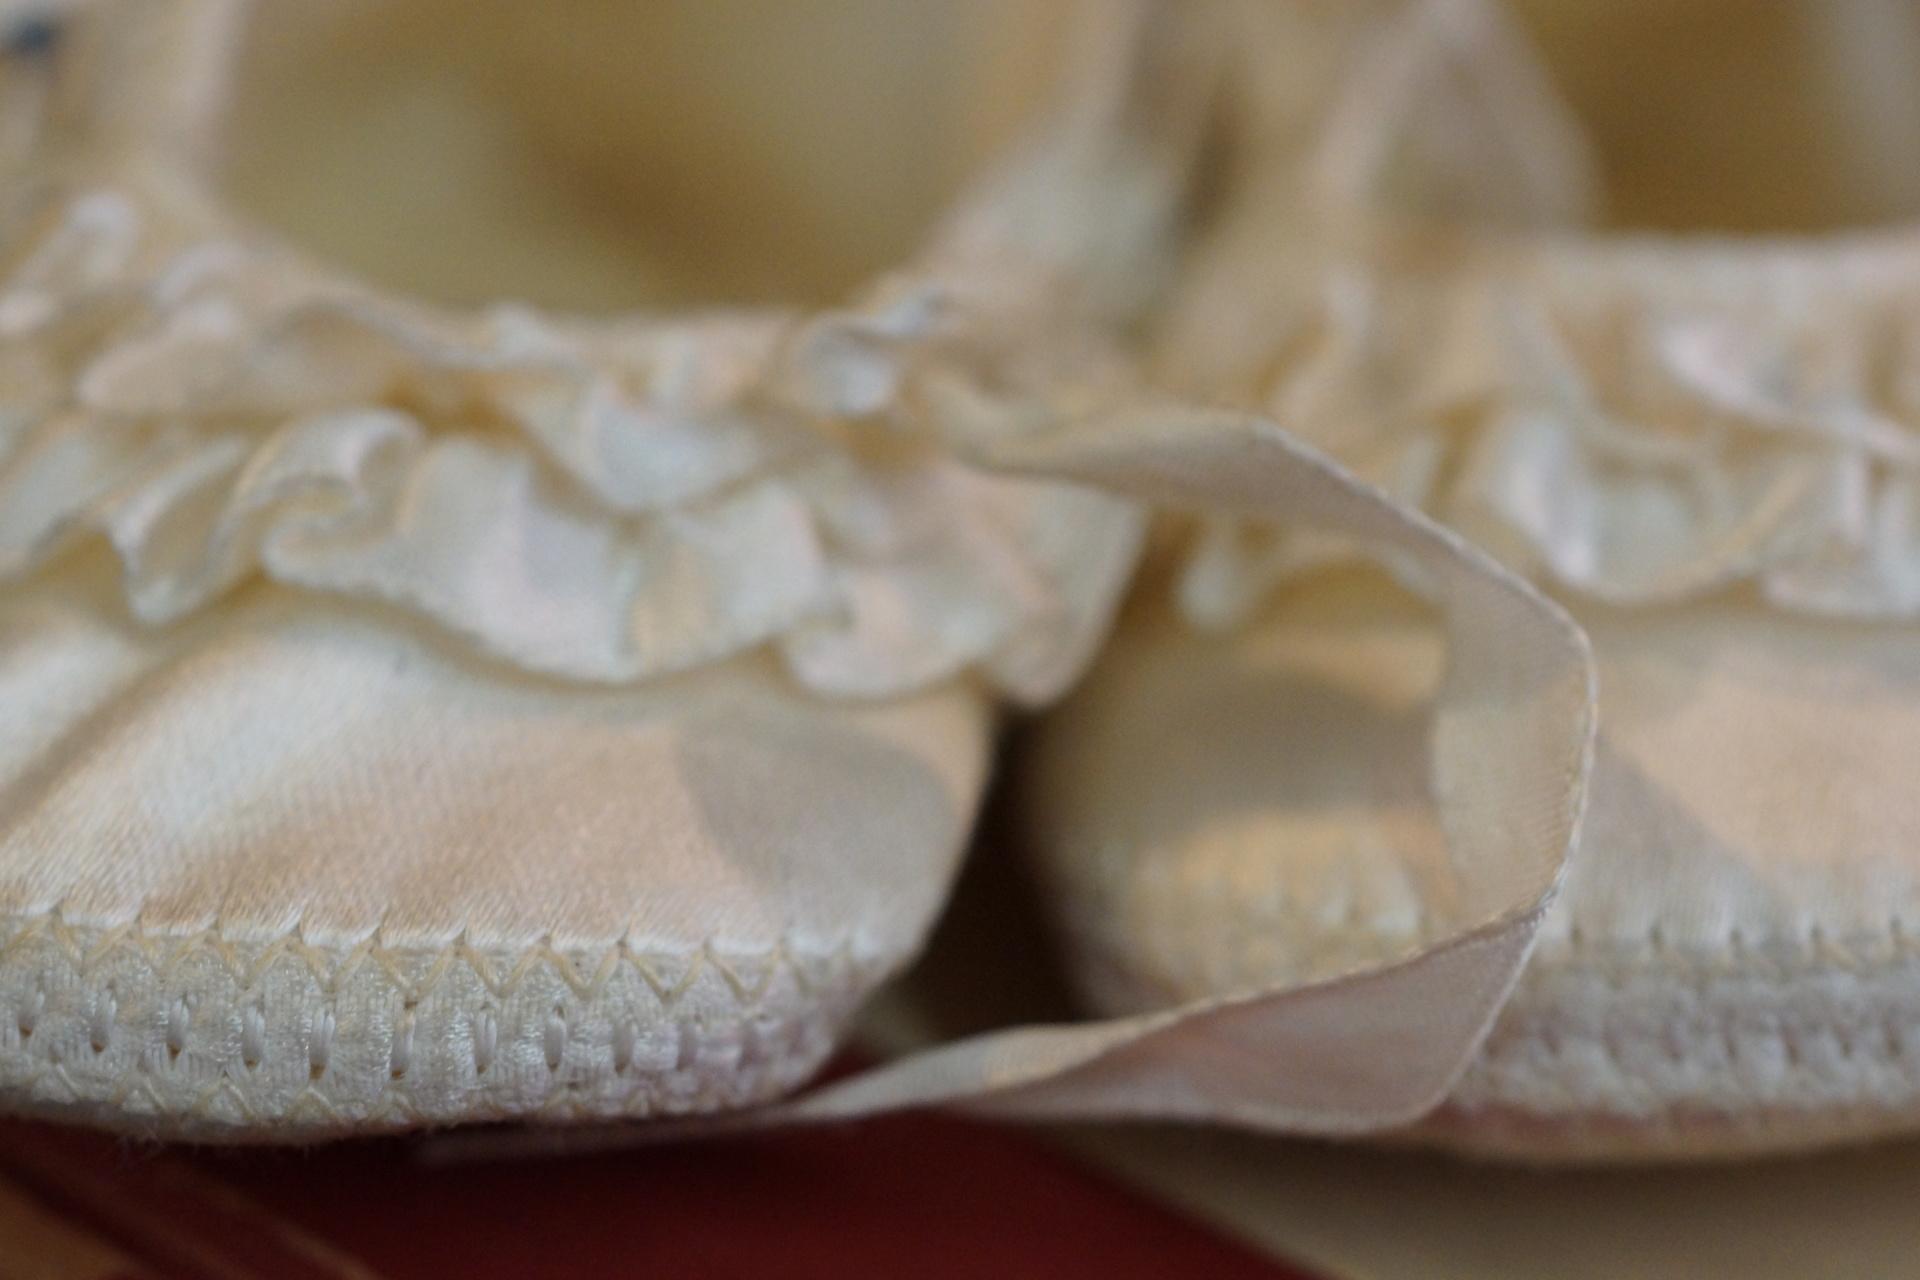 Juno's slippers